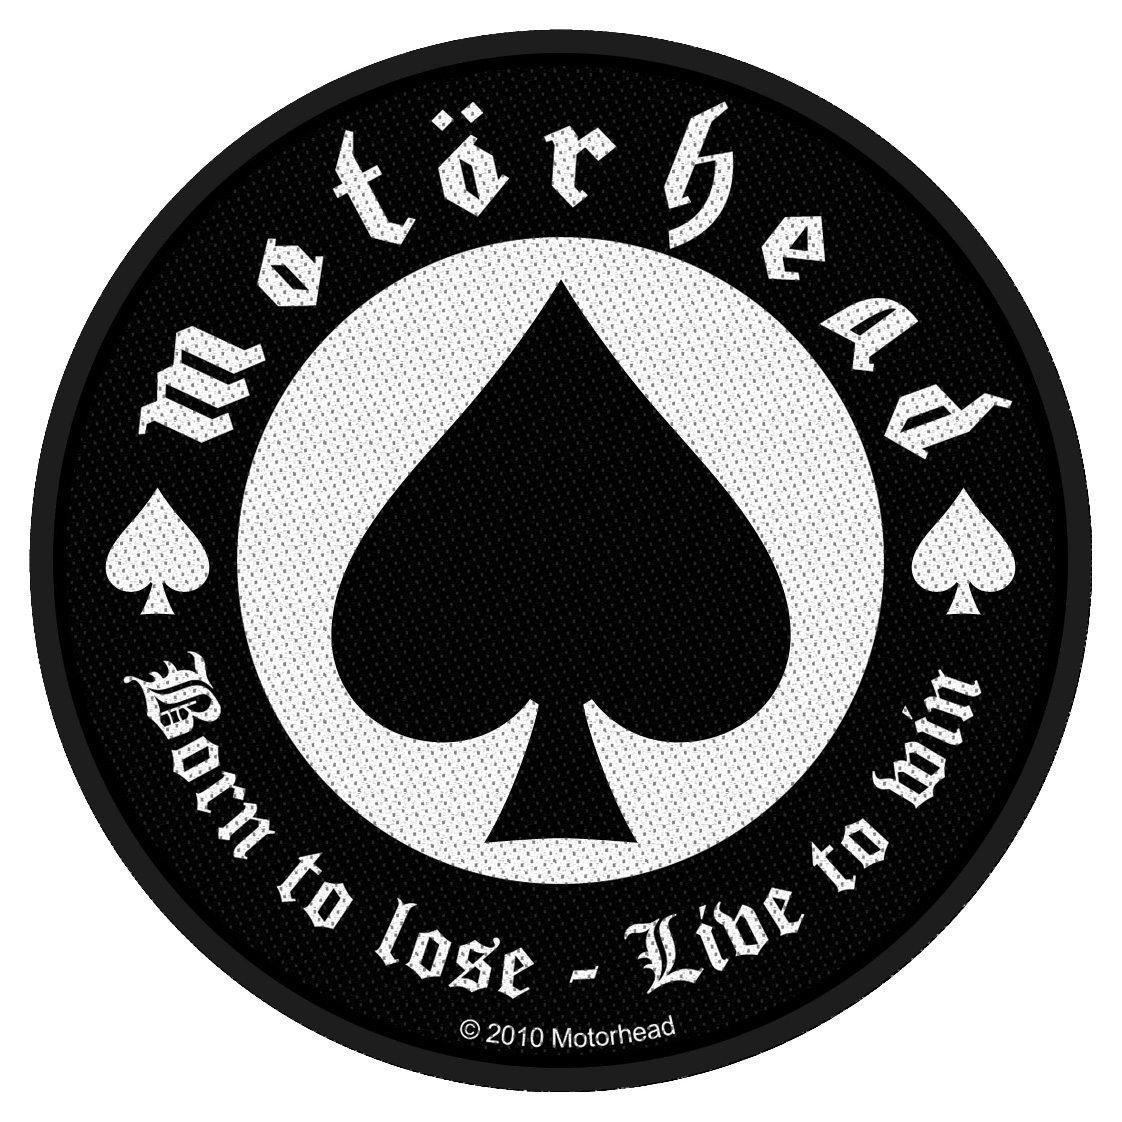 Motorhead Woven Patch Born To Lose.